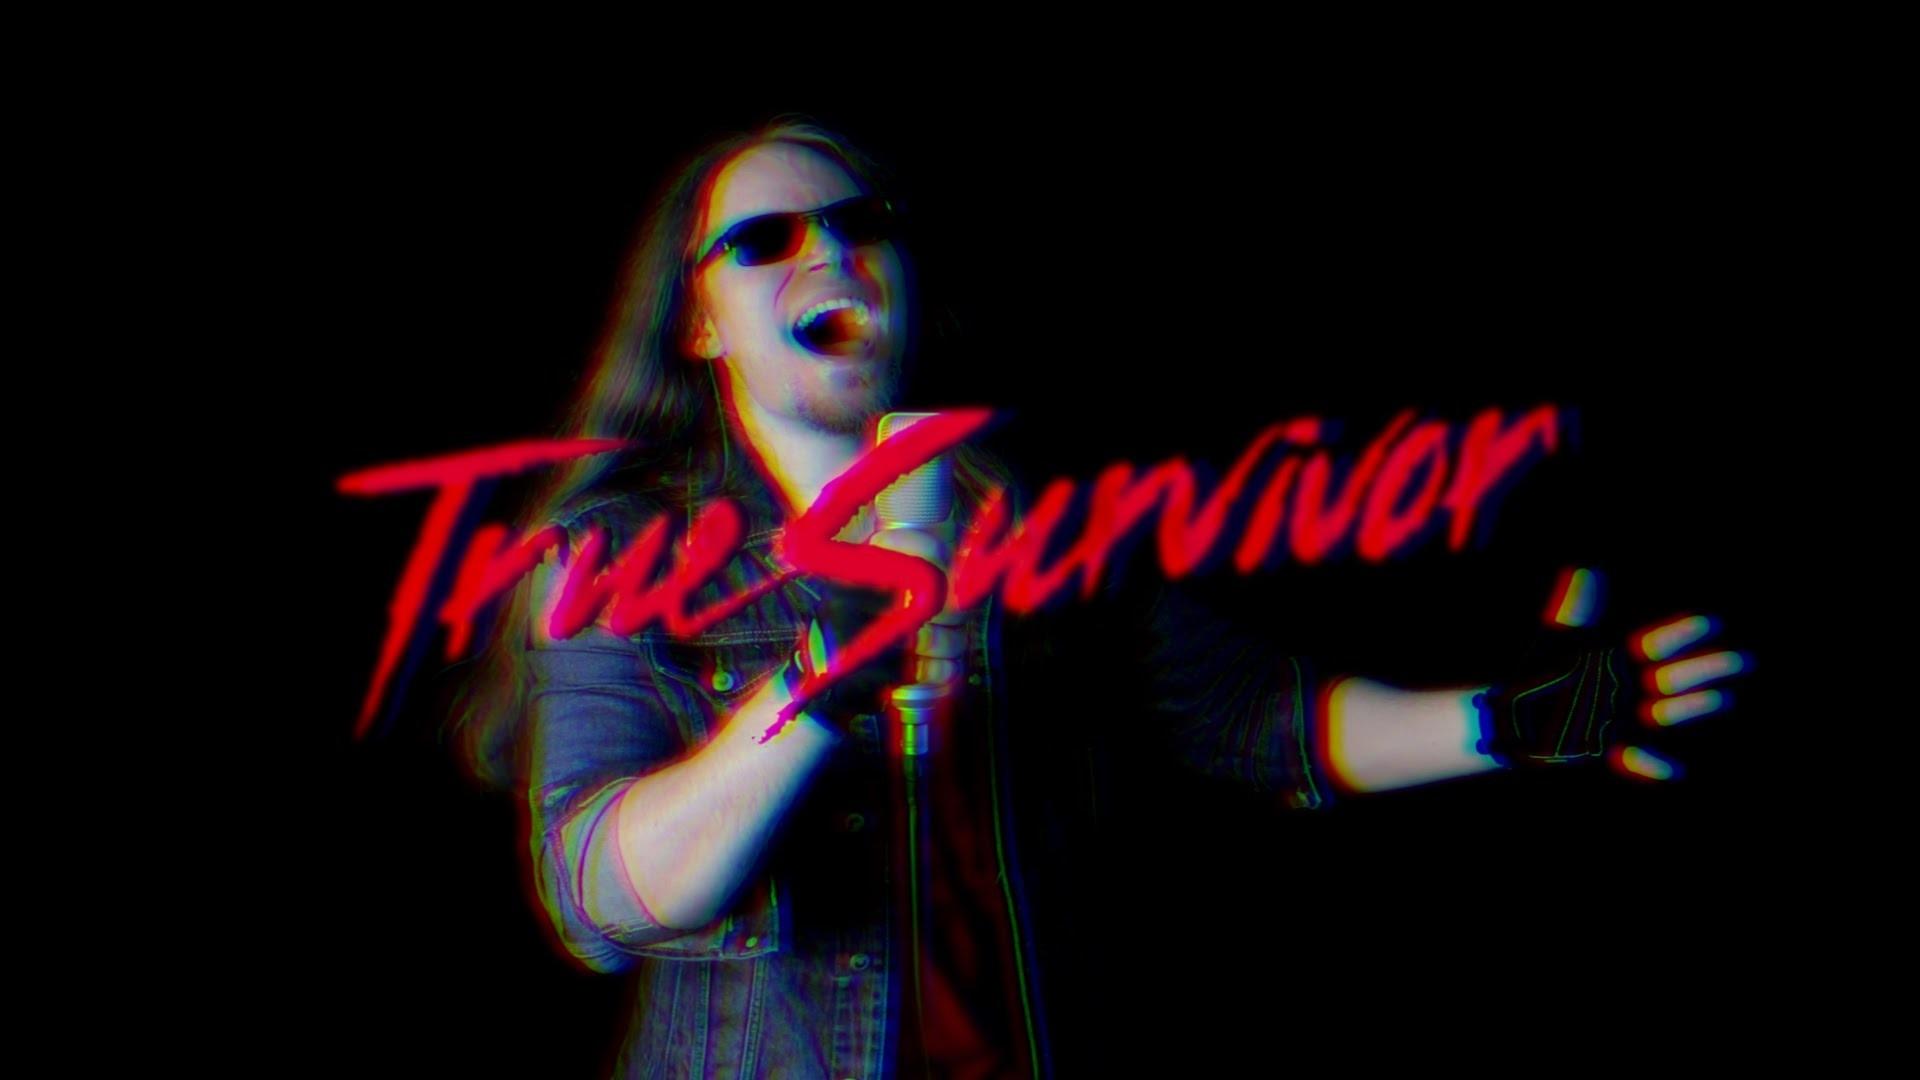 David Hasselhoff – True Survivor (Metal Cover by Agordas) Kung Fury –  YouTube